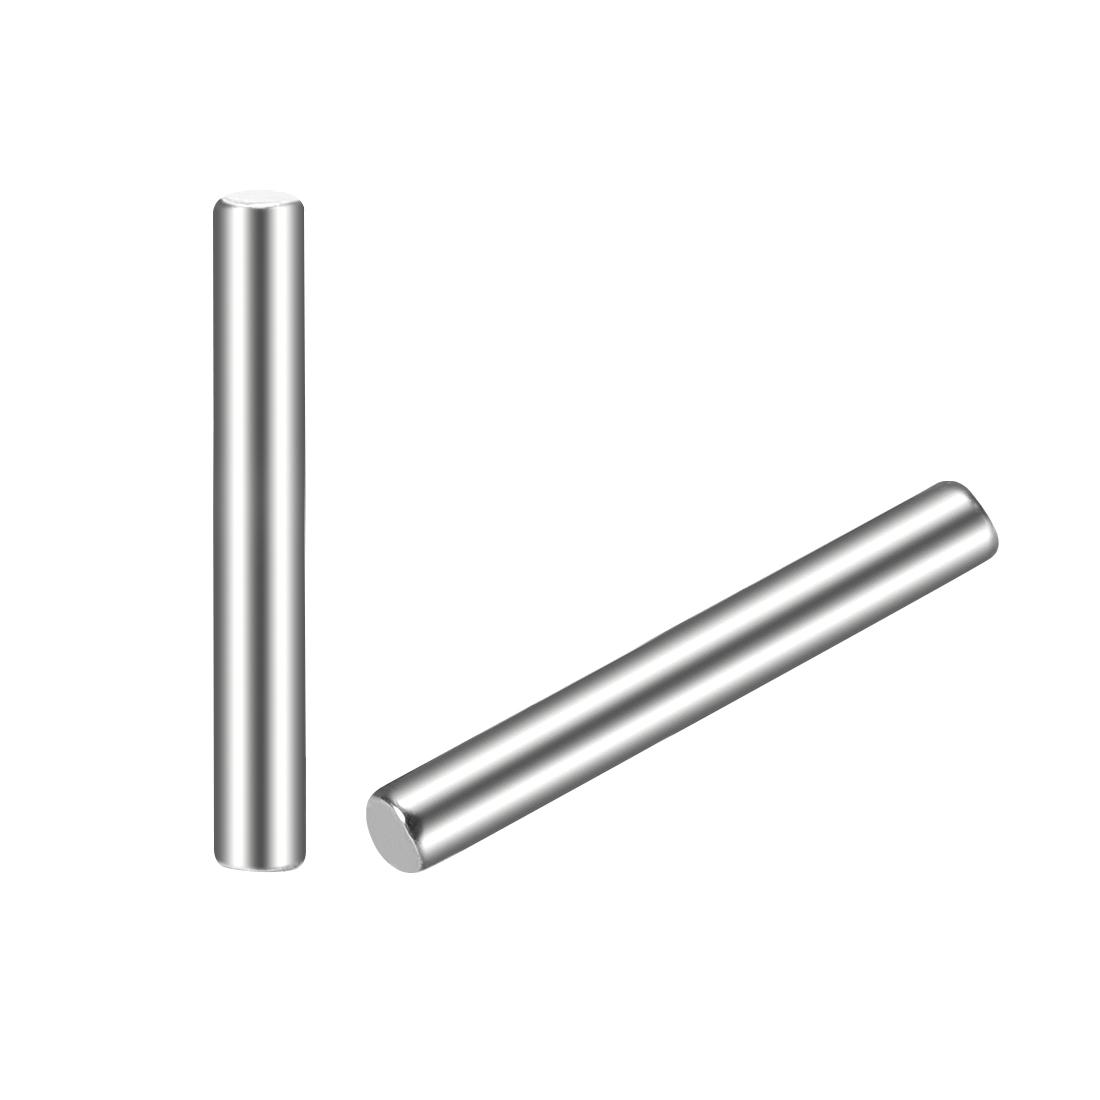 25Pcs 2mm x 16mm Dowel Pin 304 Stainless Steel Shelf Support Pin Fasten